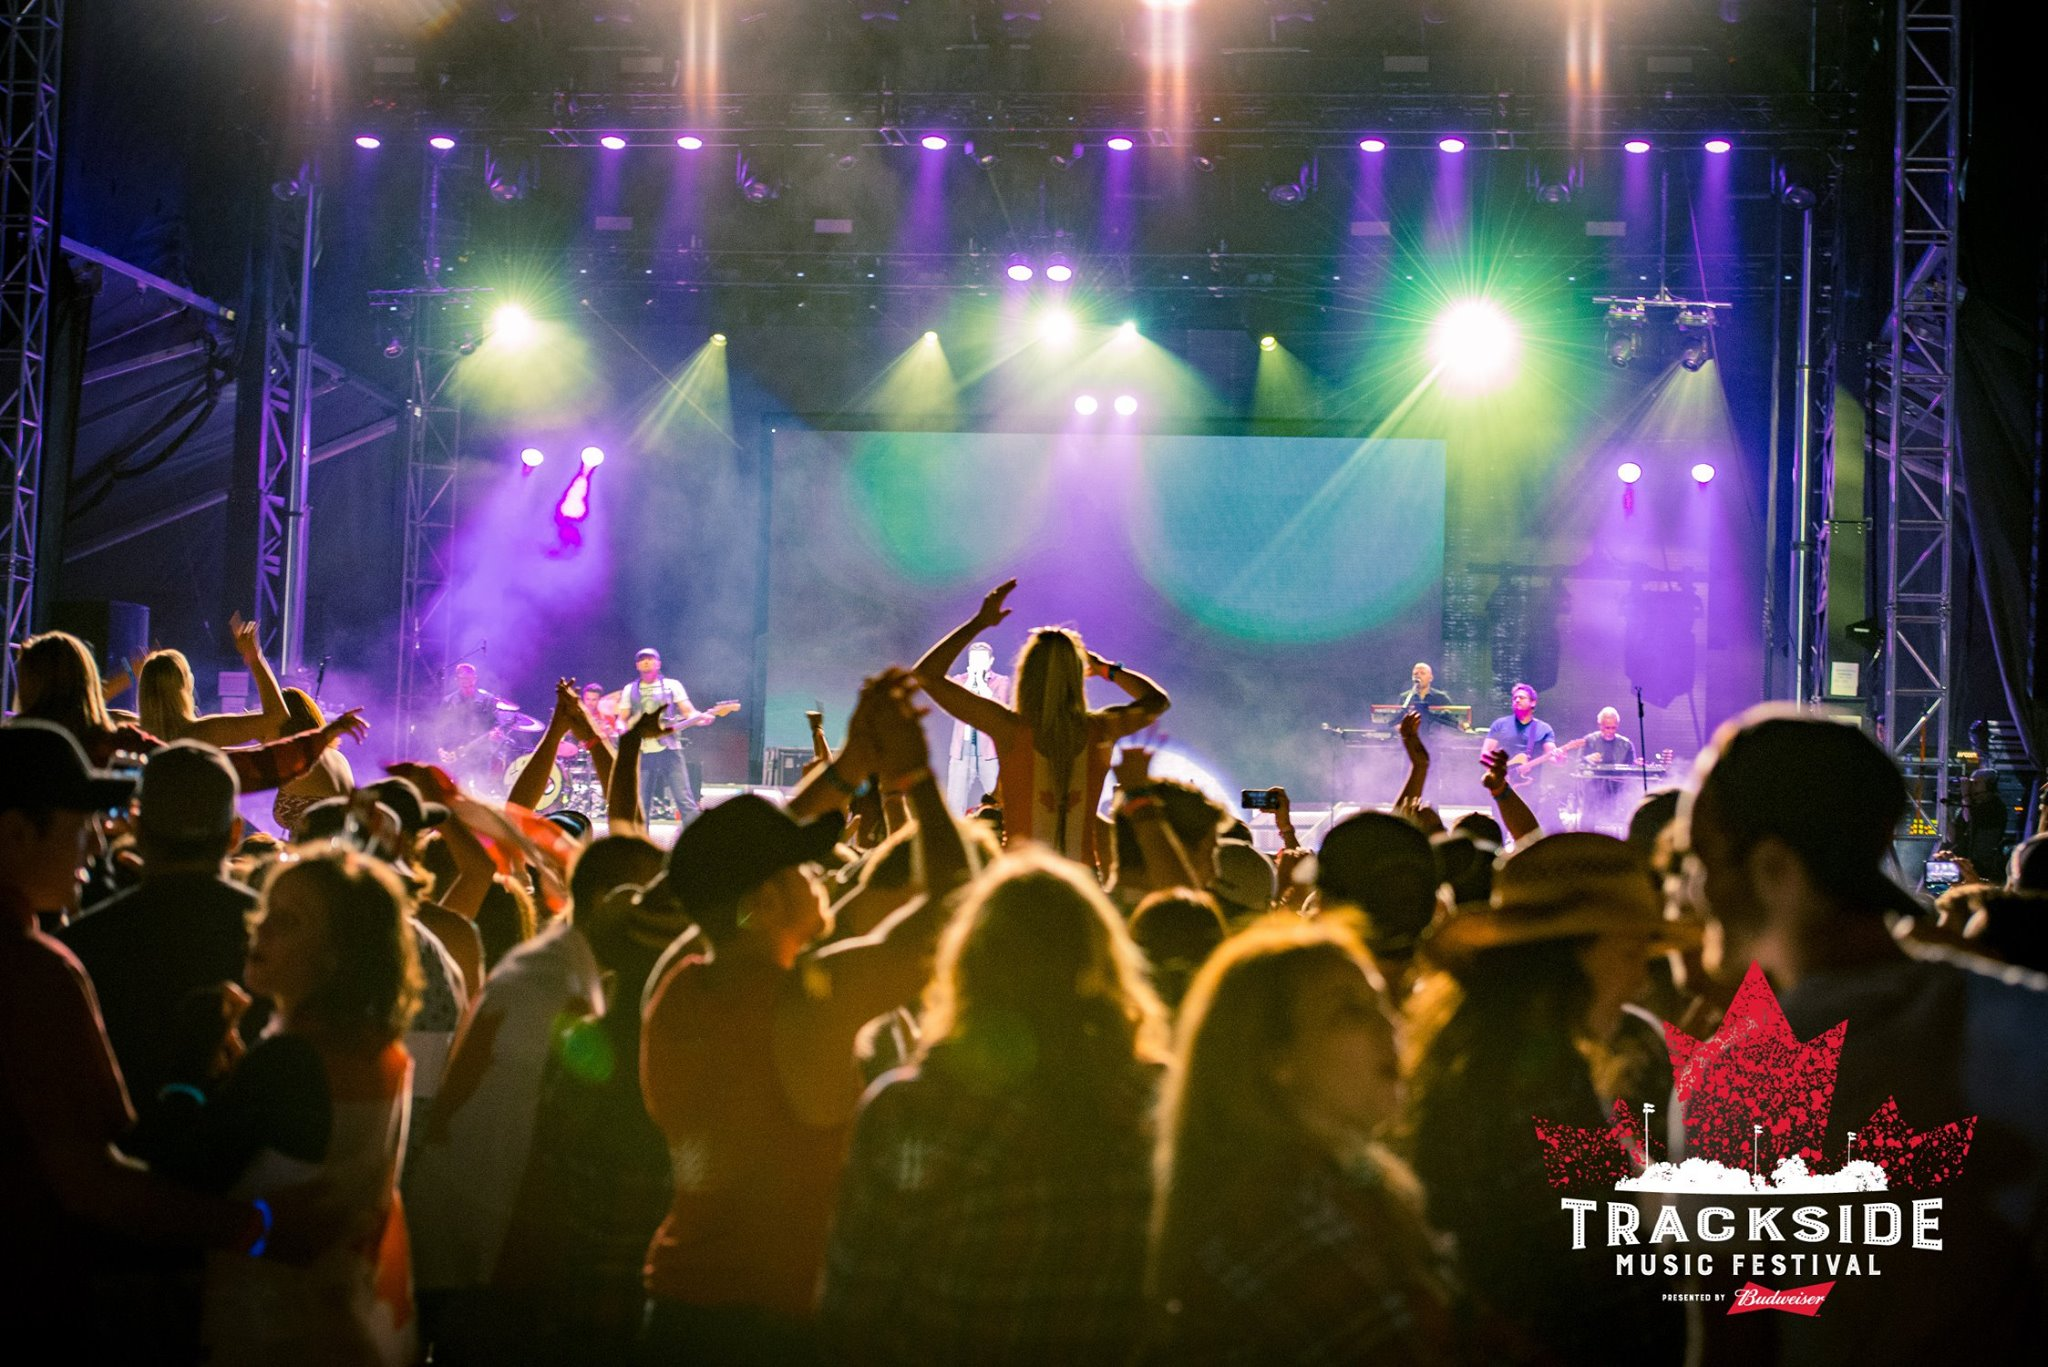 Kick It at Trackside Music Festival